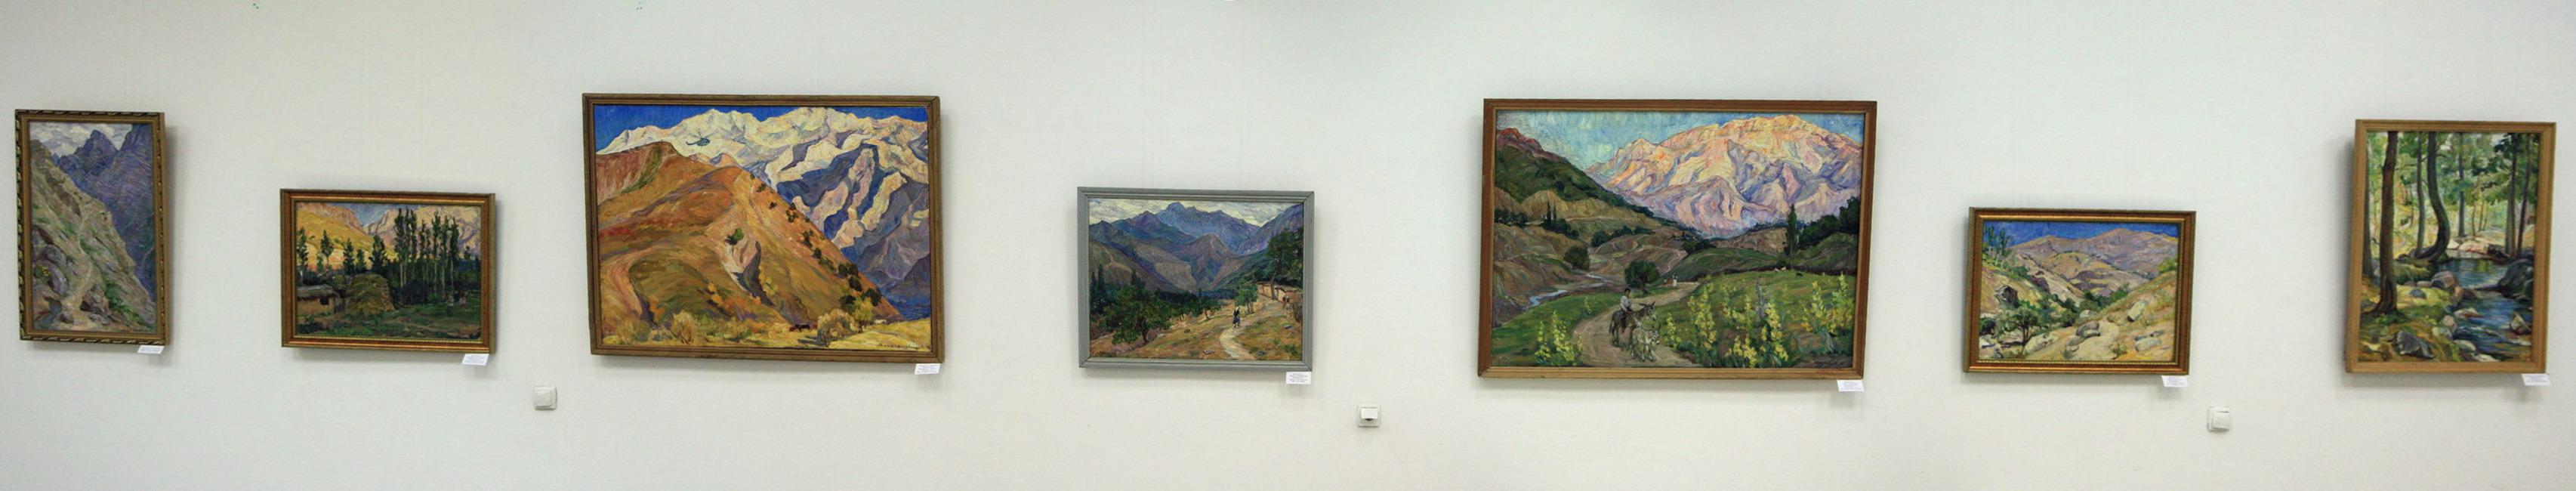 Экспозиция картин Мордвинцевой Галины 2.